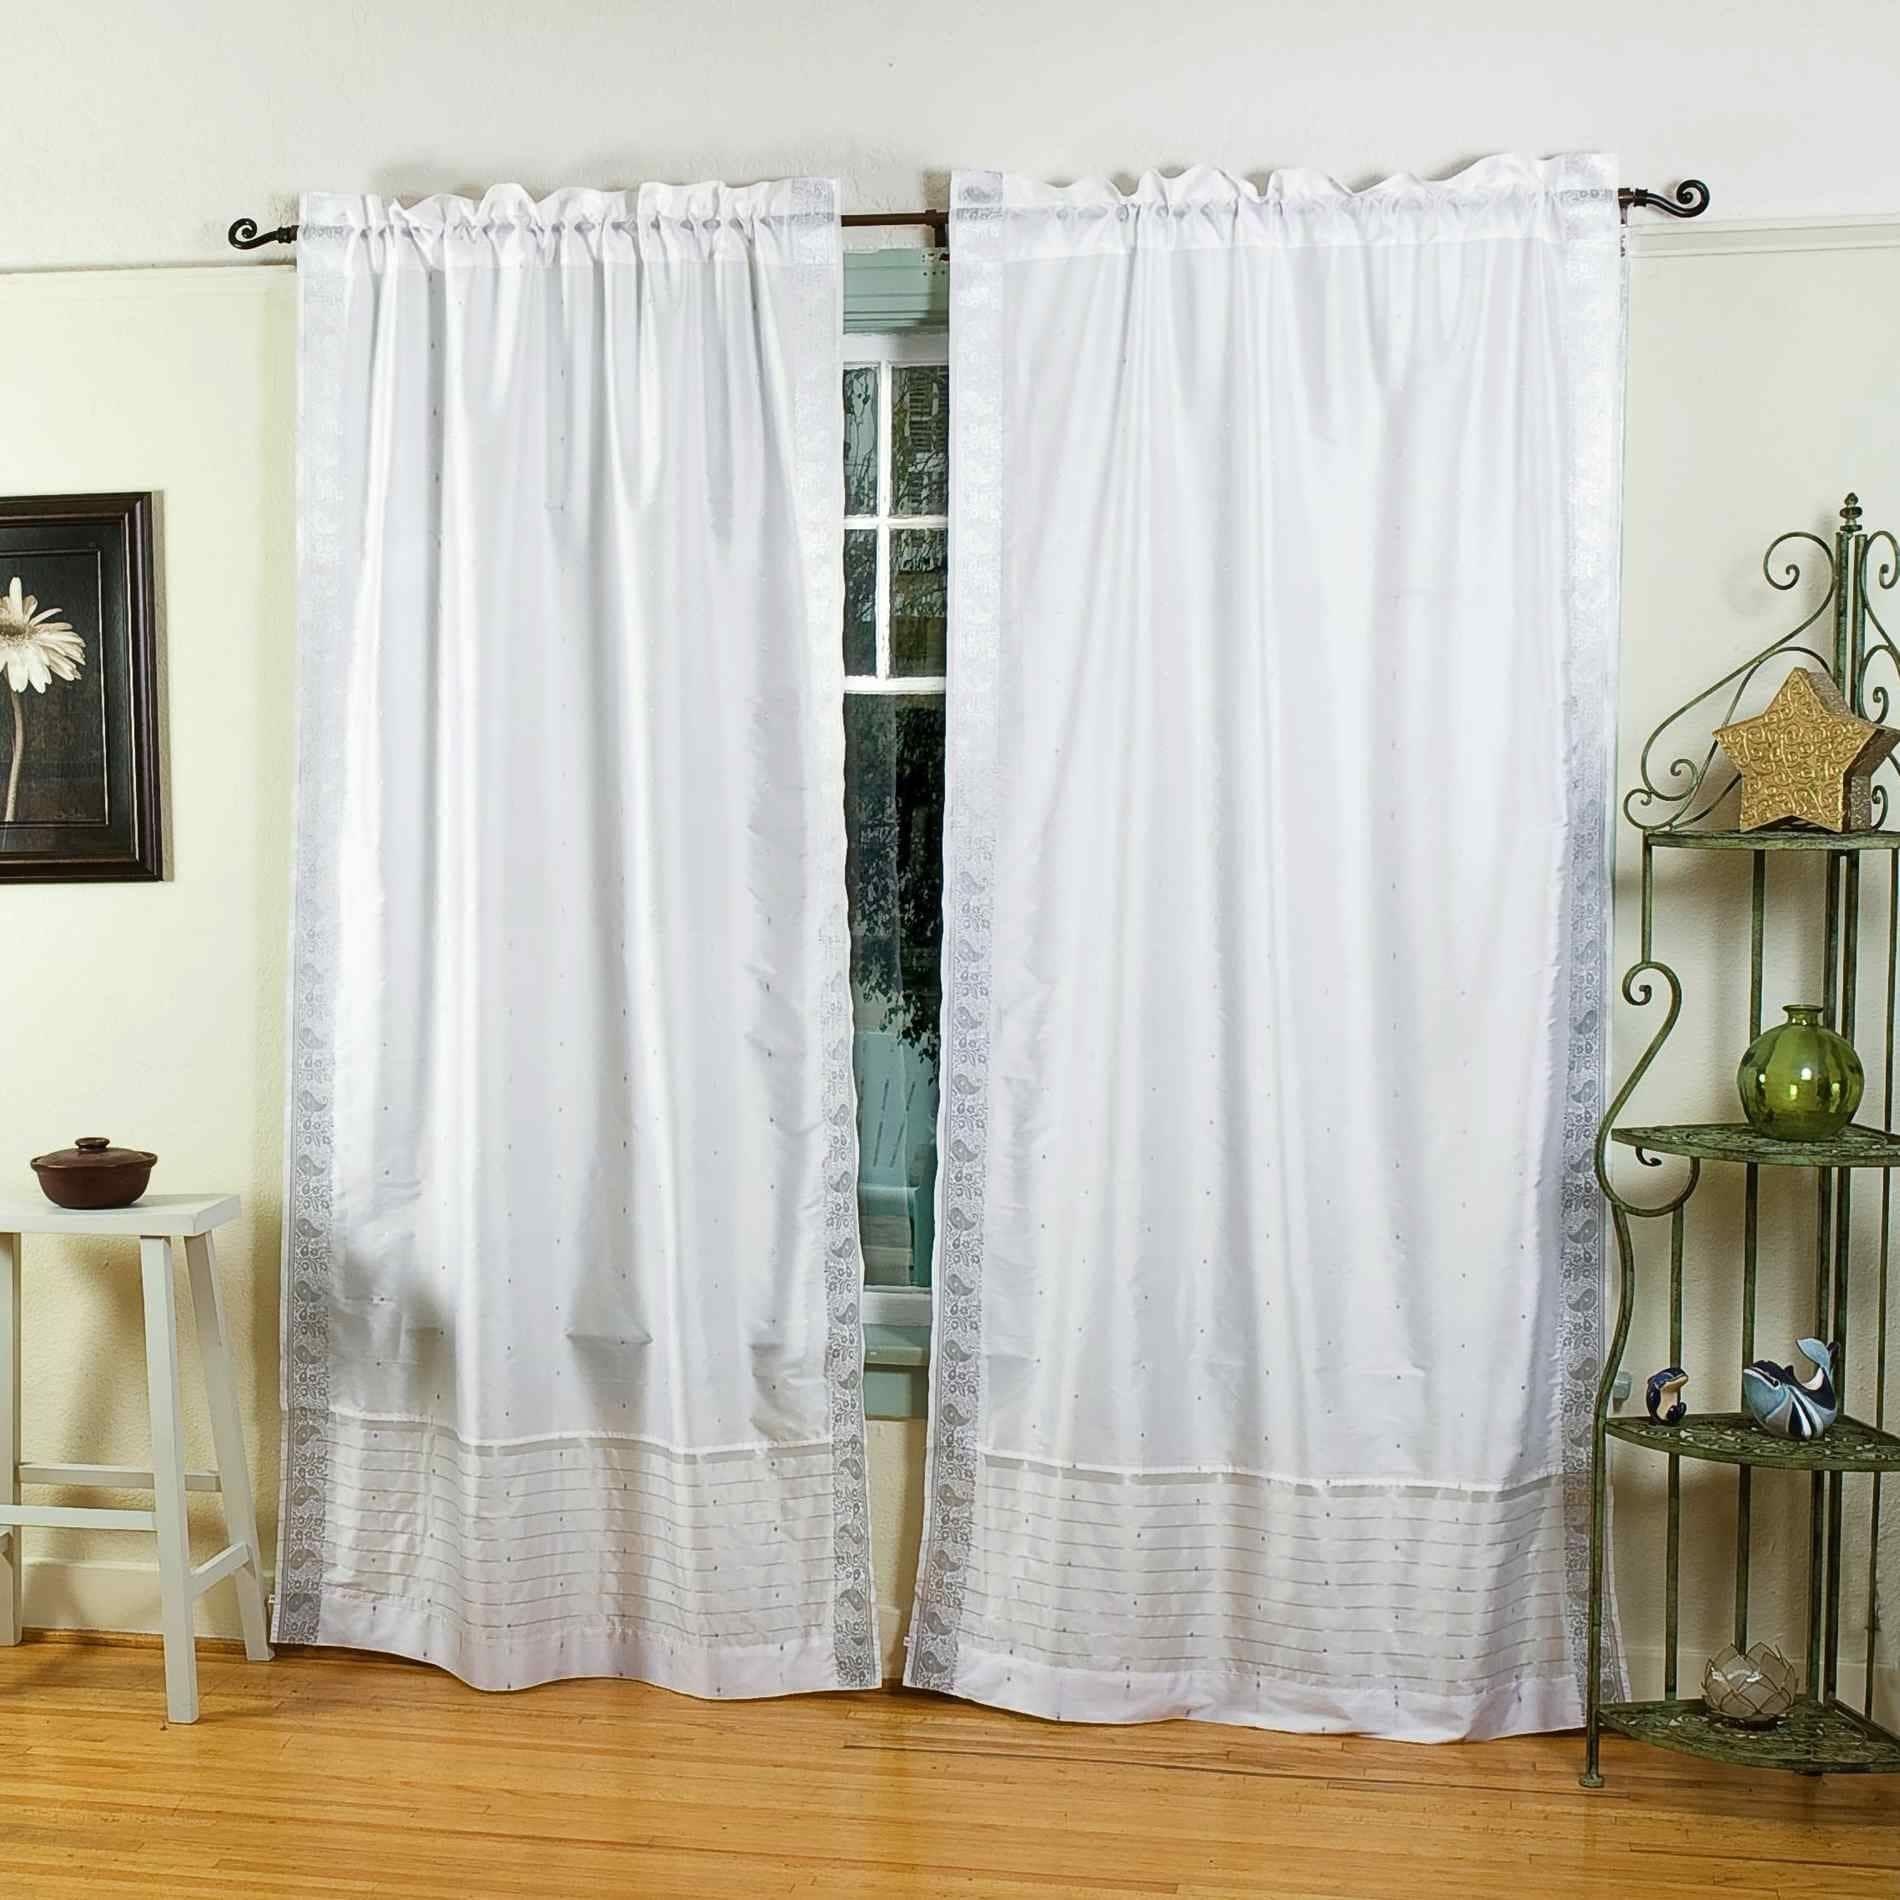 White Silver Rod Pocket Sheer Sari Curtain Drape Panel Pair